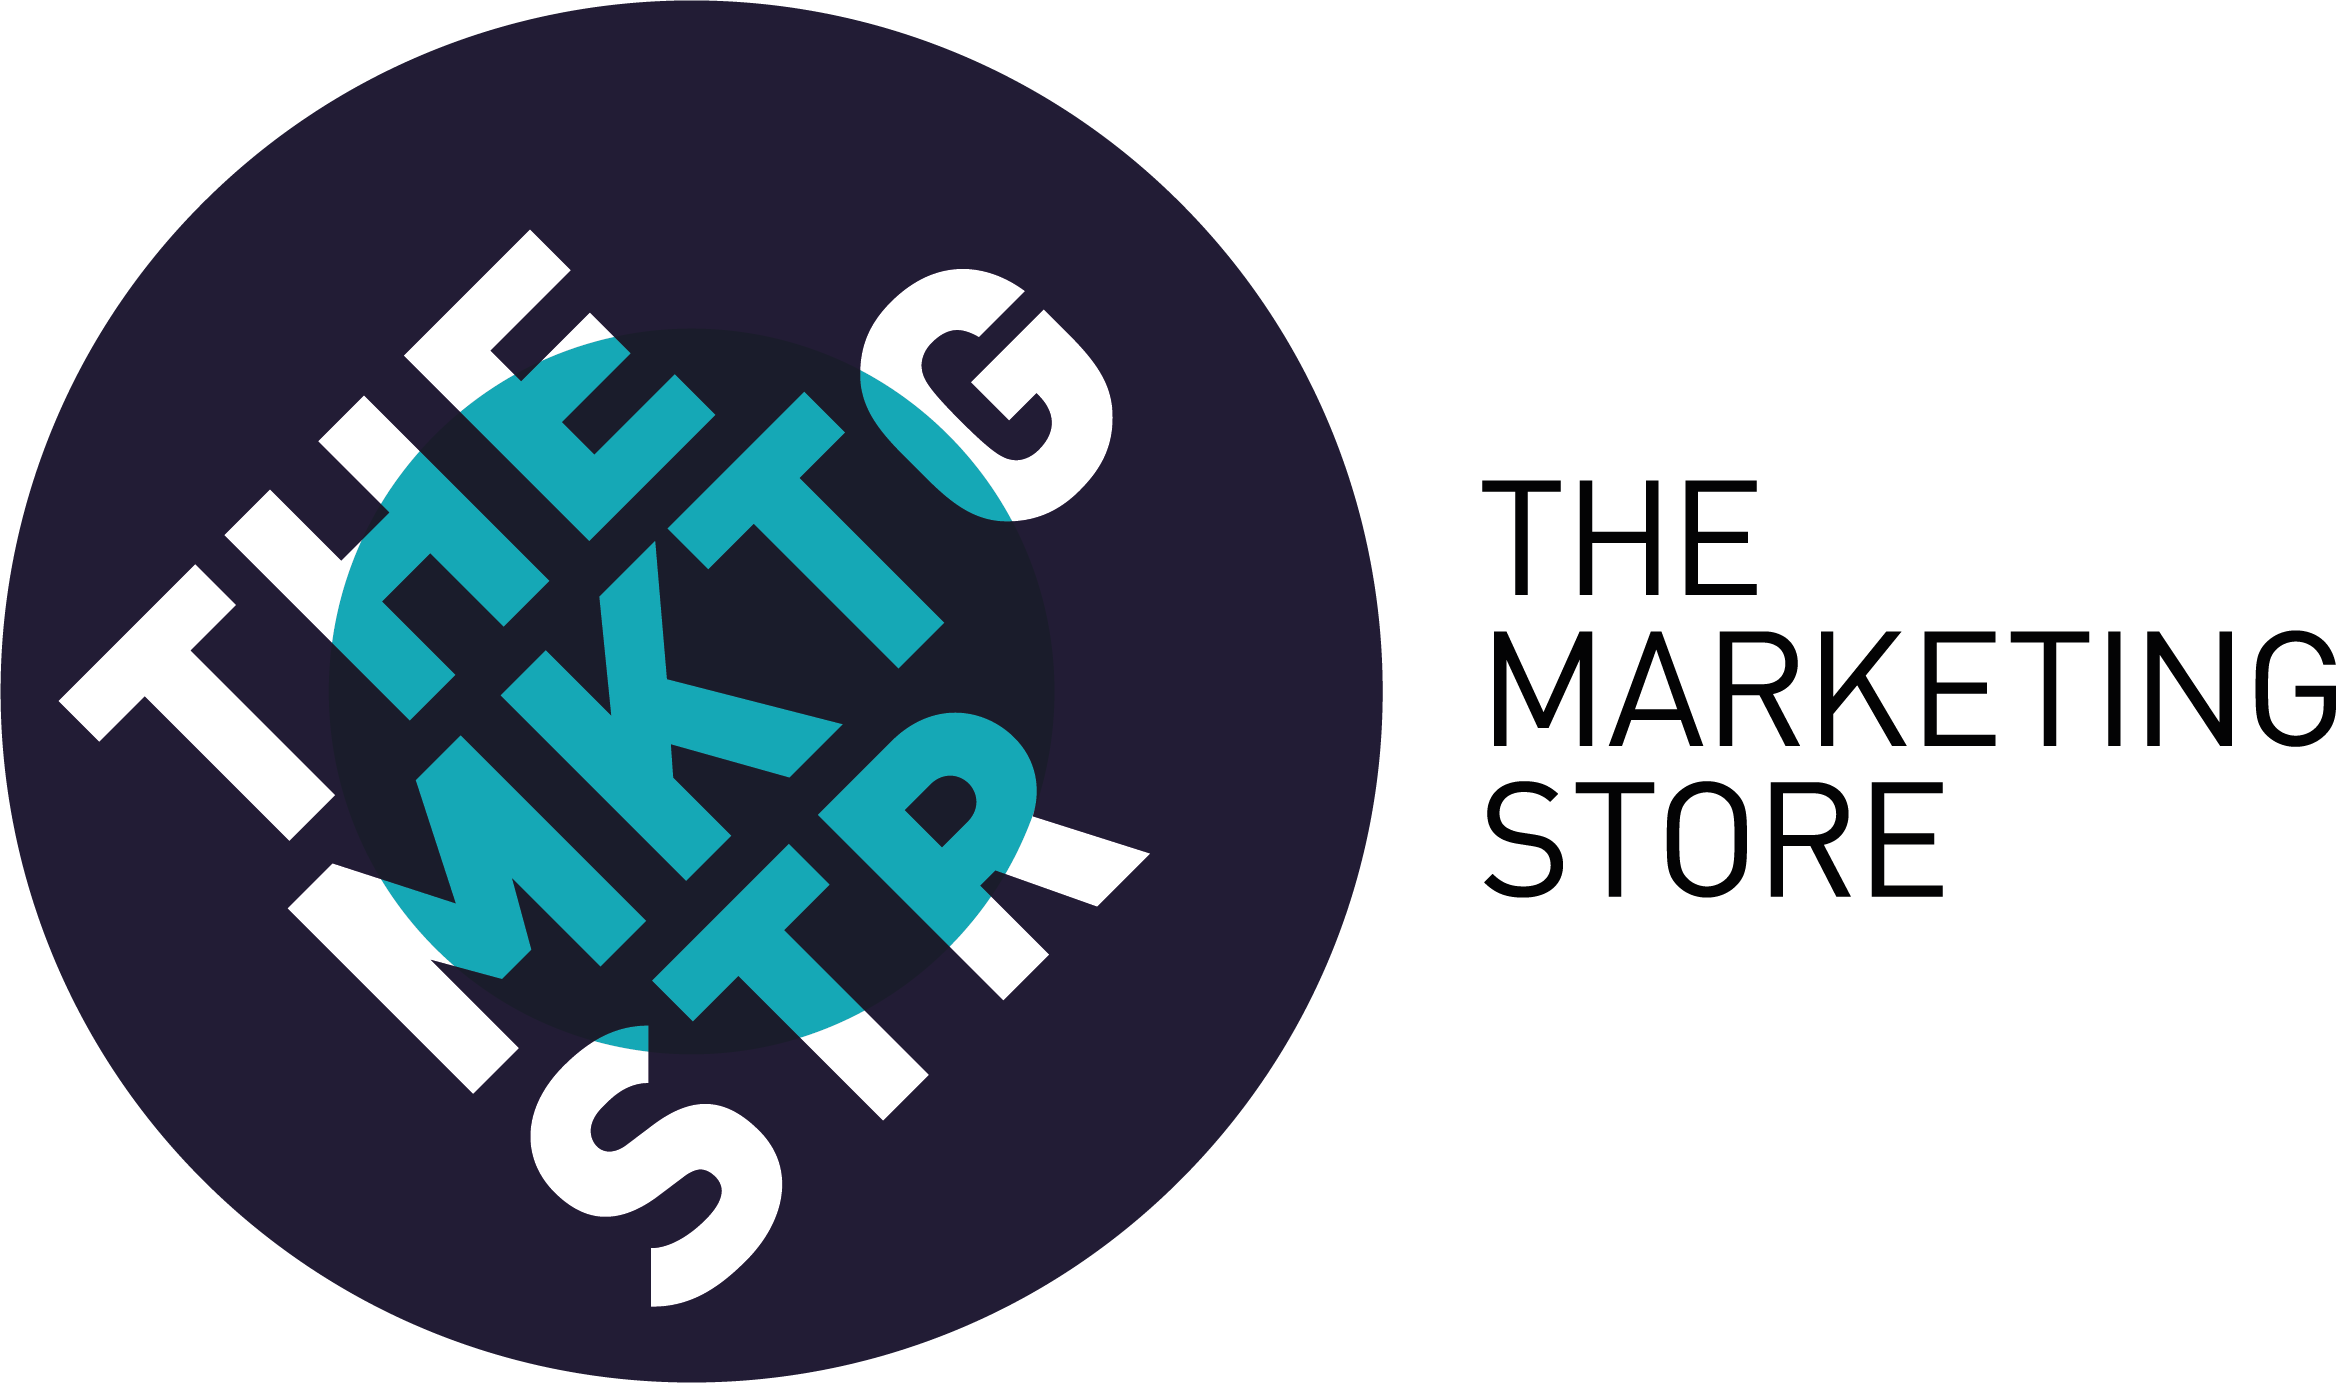 marketing store logo